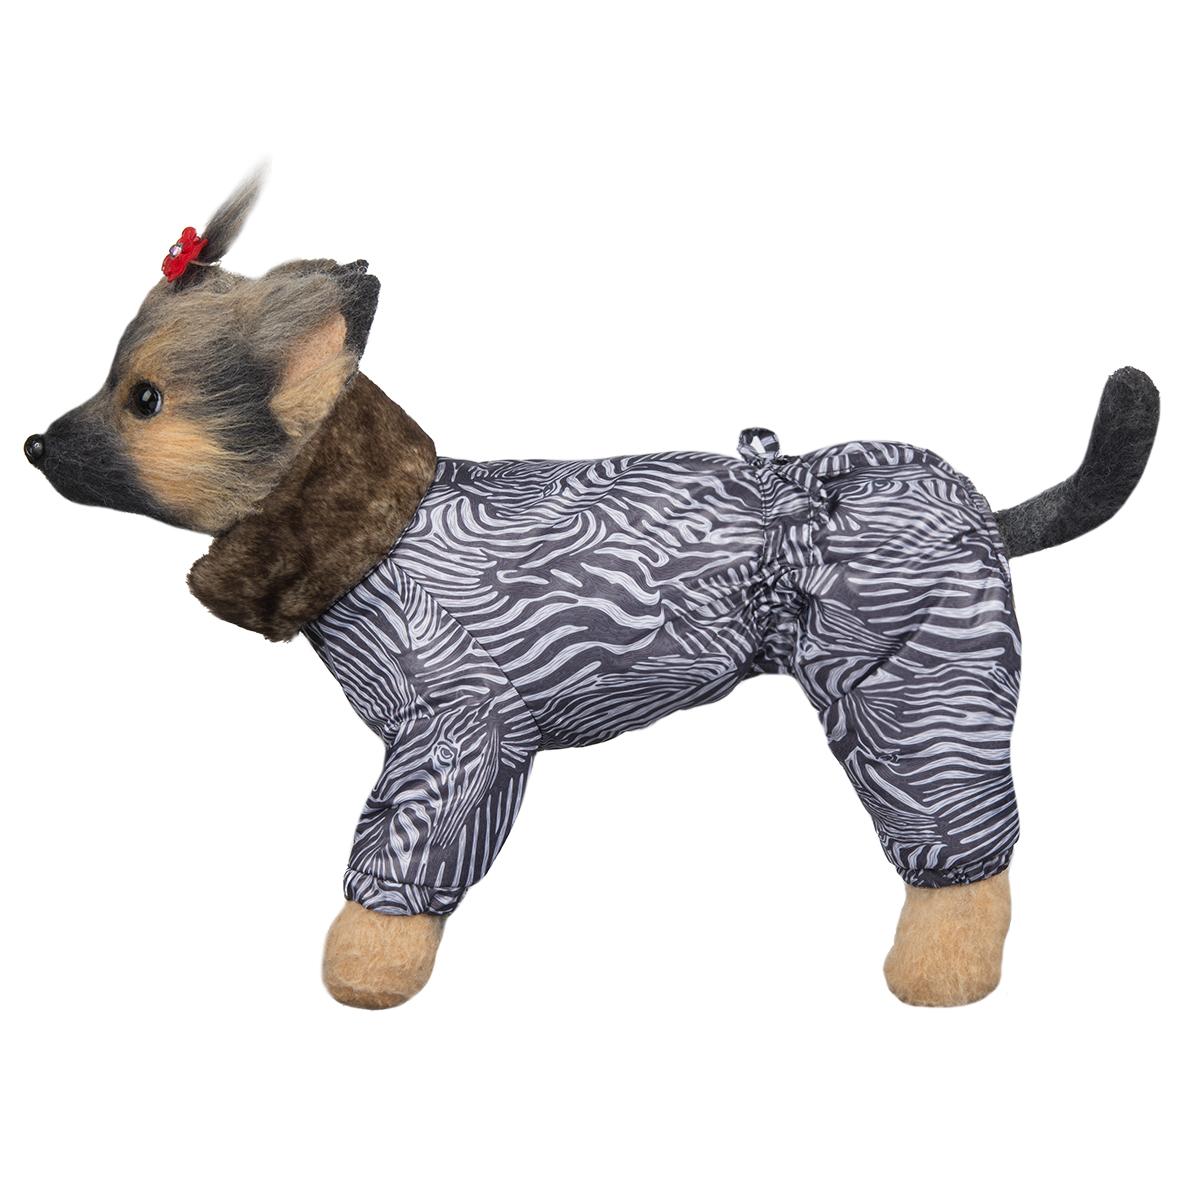 "Комбинезон для собак Dogmoda ""Хаген"", унисекс, цвет: белый, серый. Размер 1 (S)"